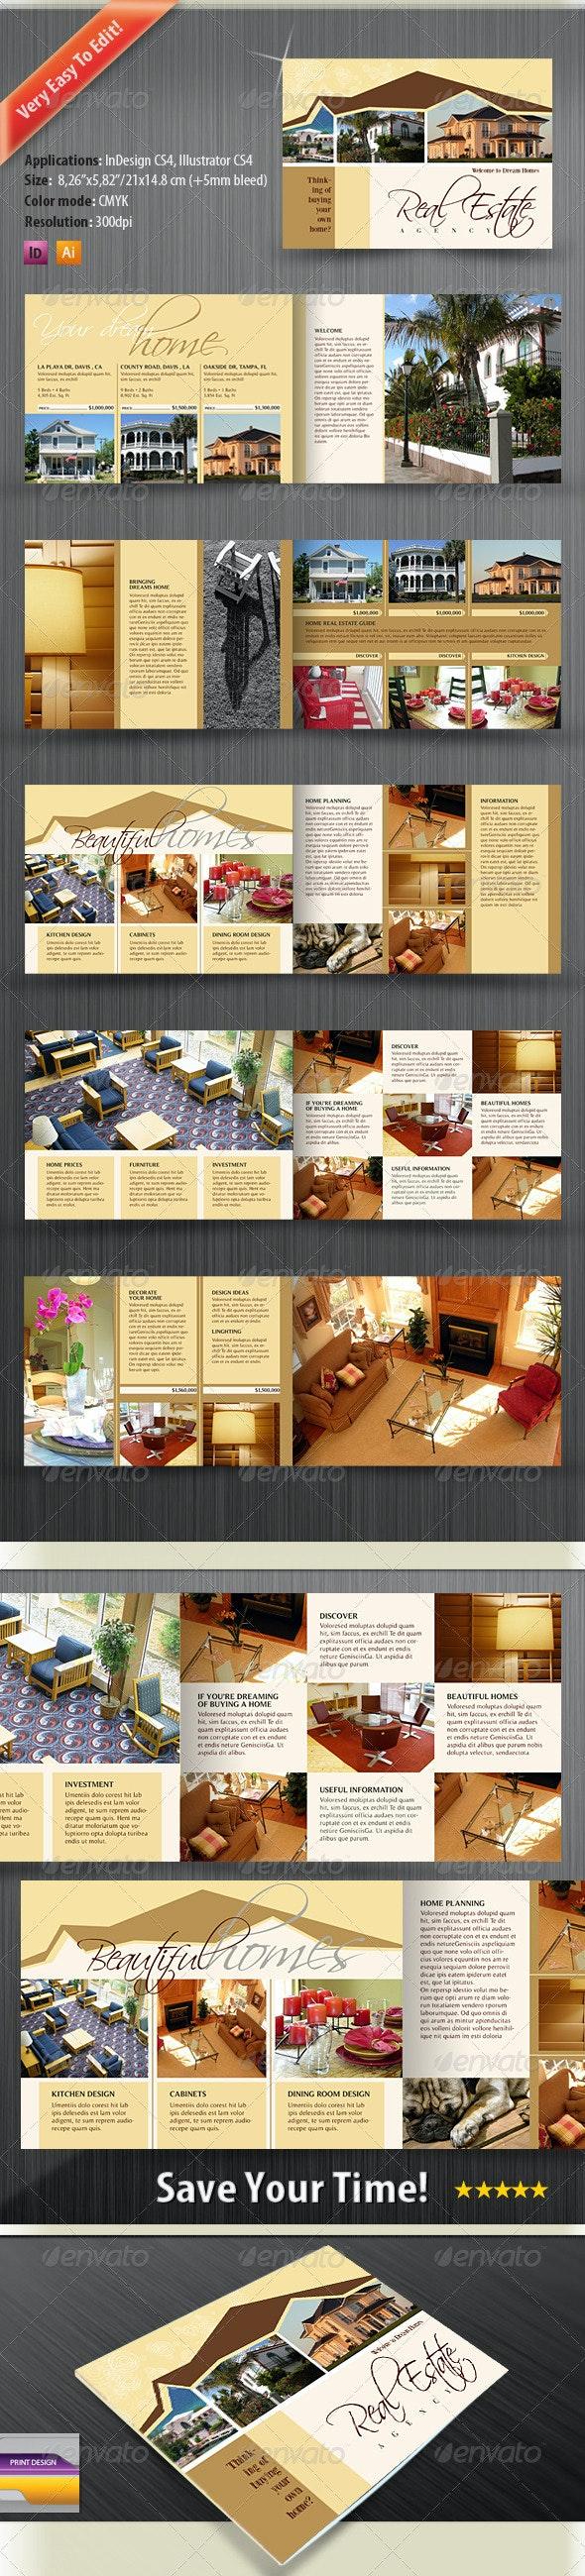 Real Estate Catalog / Brochure - Catalogs Brochures